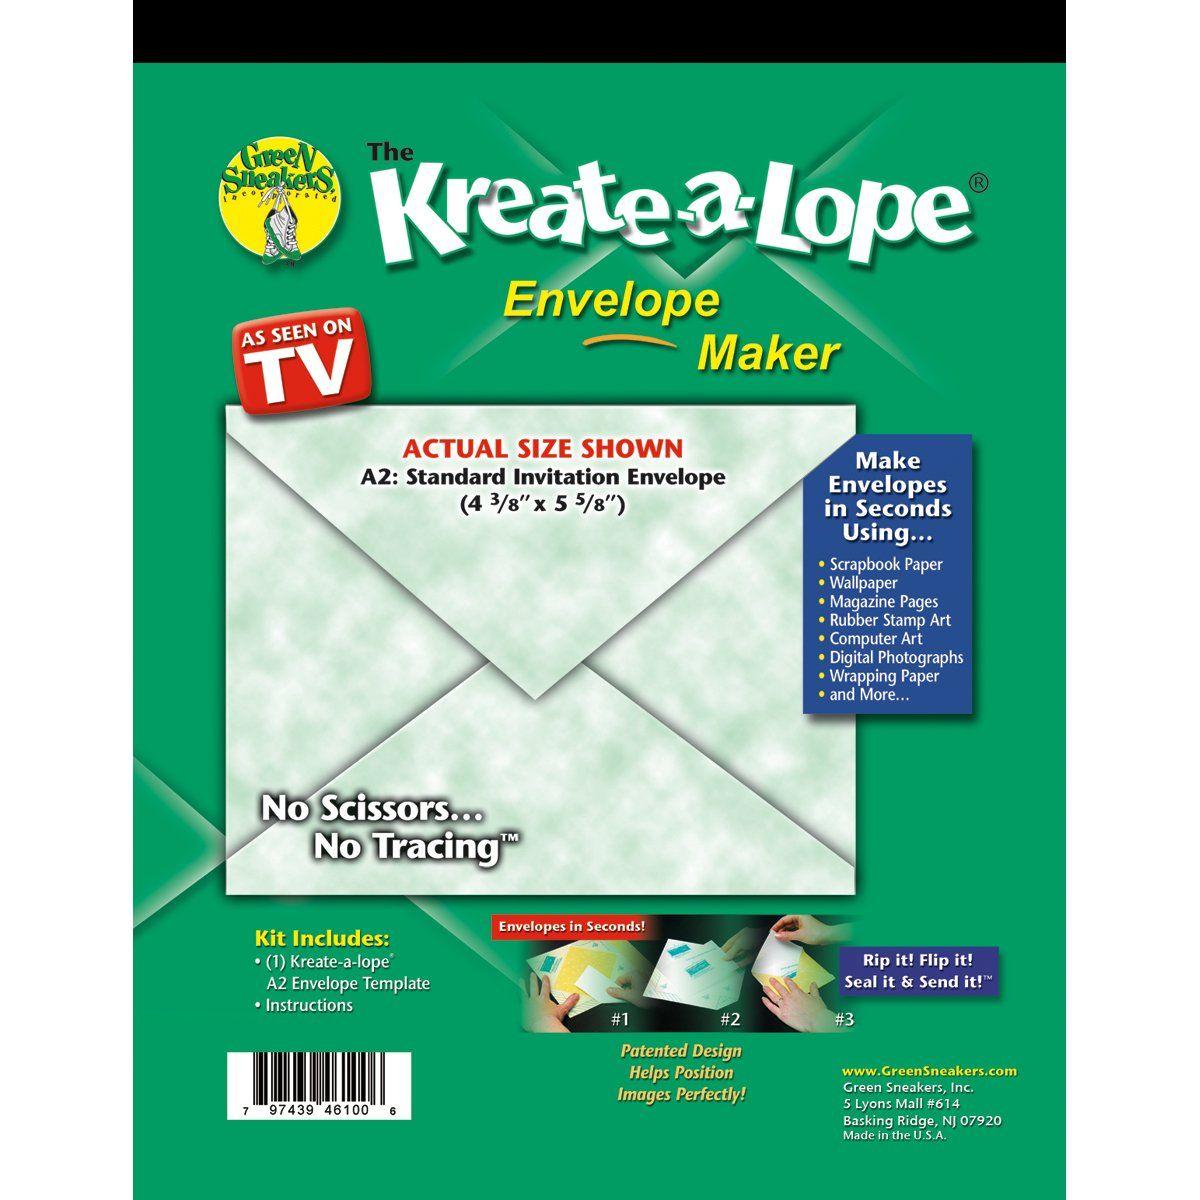 Scrapbook paper envelope template - Envelope Templates